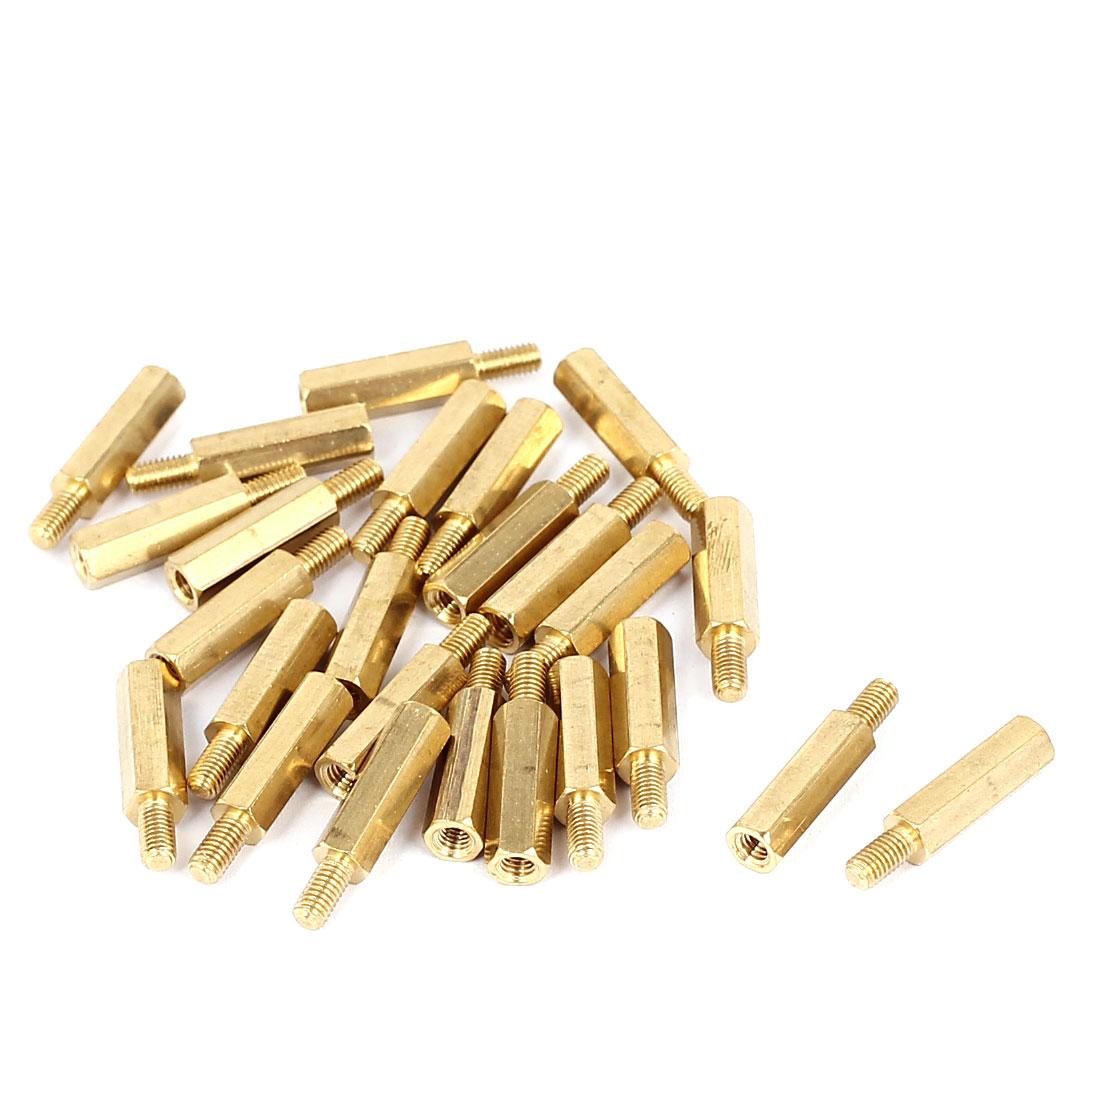 M3x15+6mm Female/Male Thread Brass Hex Standoff Pillar Spacer Coupler Nut 25pcs